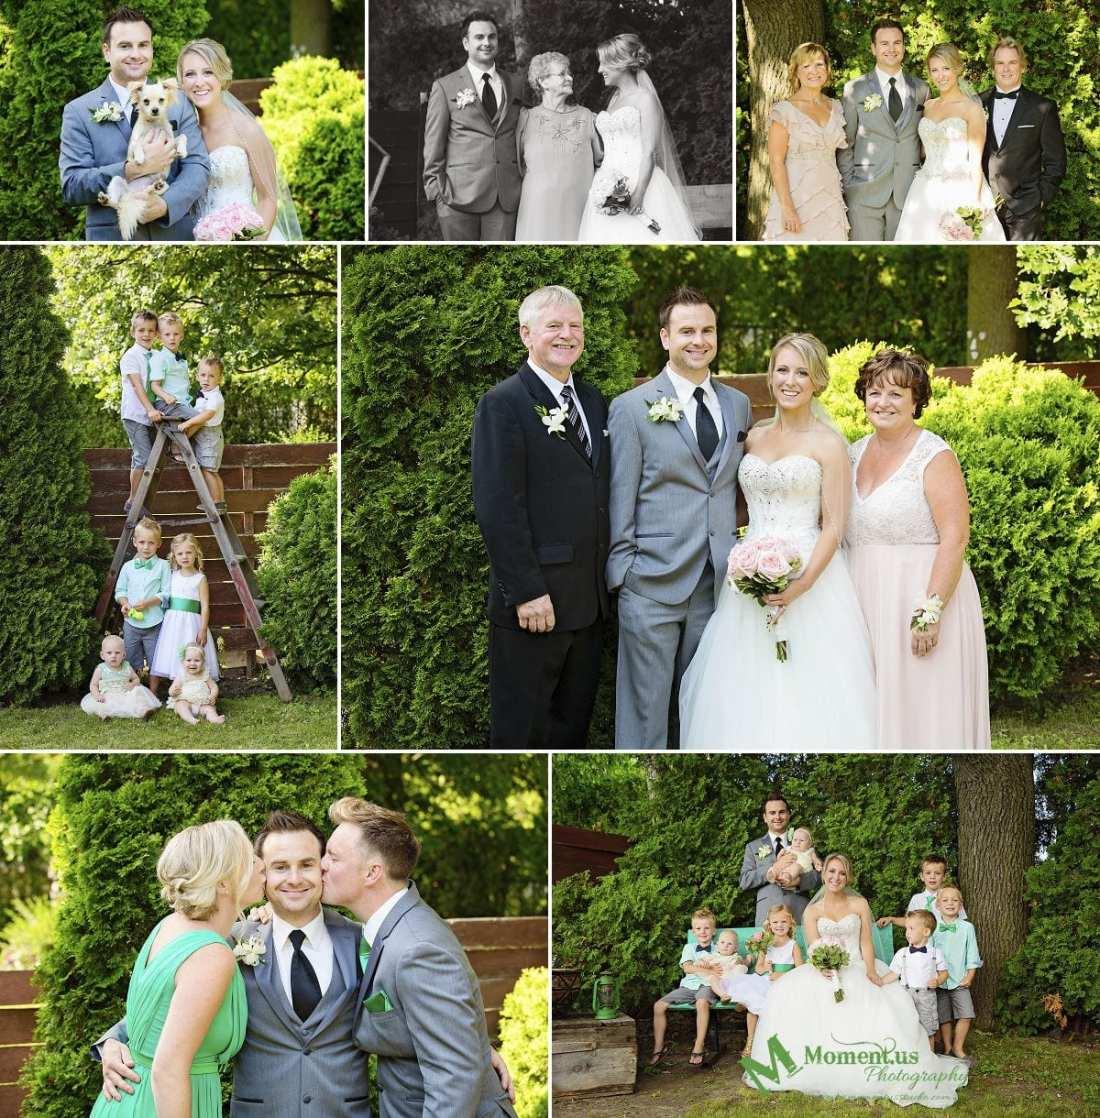 Elegant Cornwall wedding - kids on stepladder